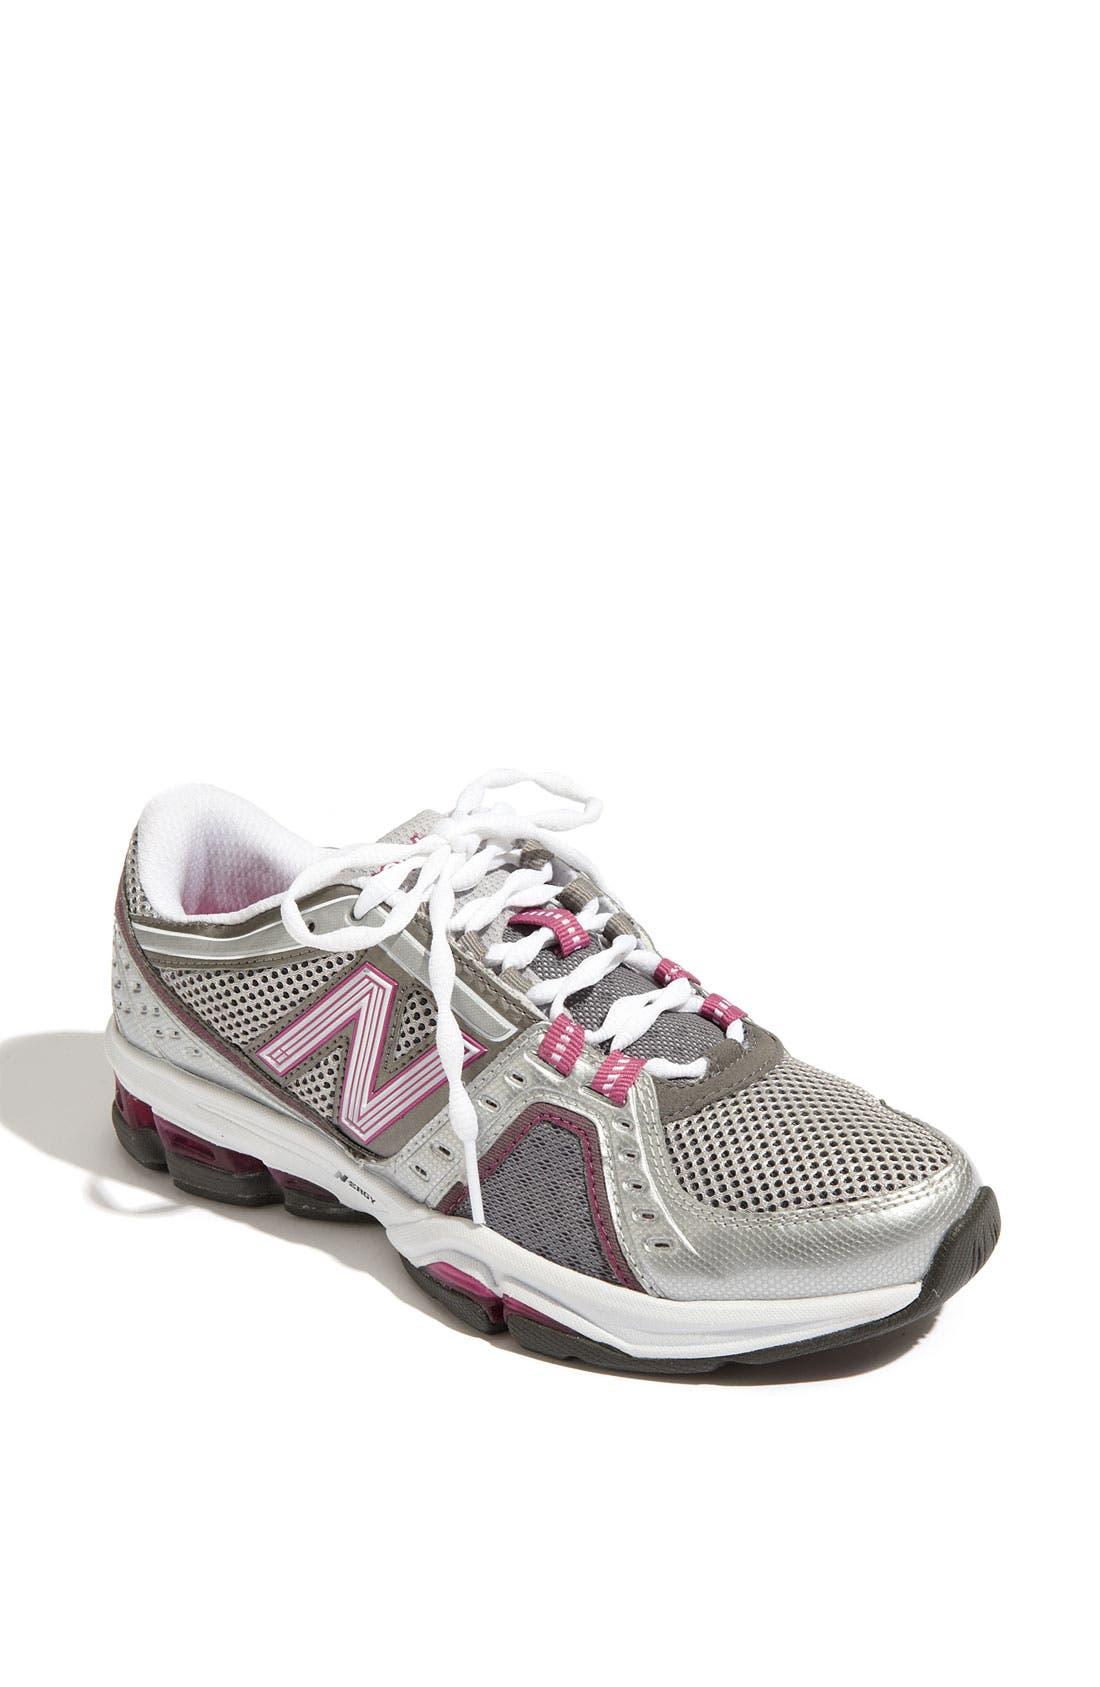 Main Image - New Balance '1211' Training Shoe (Women)